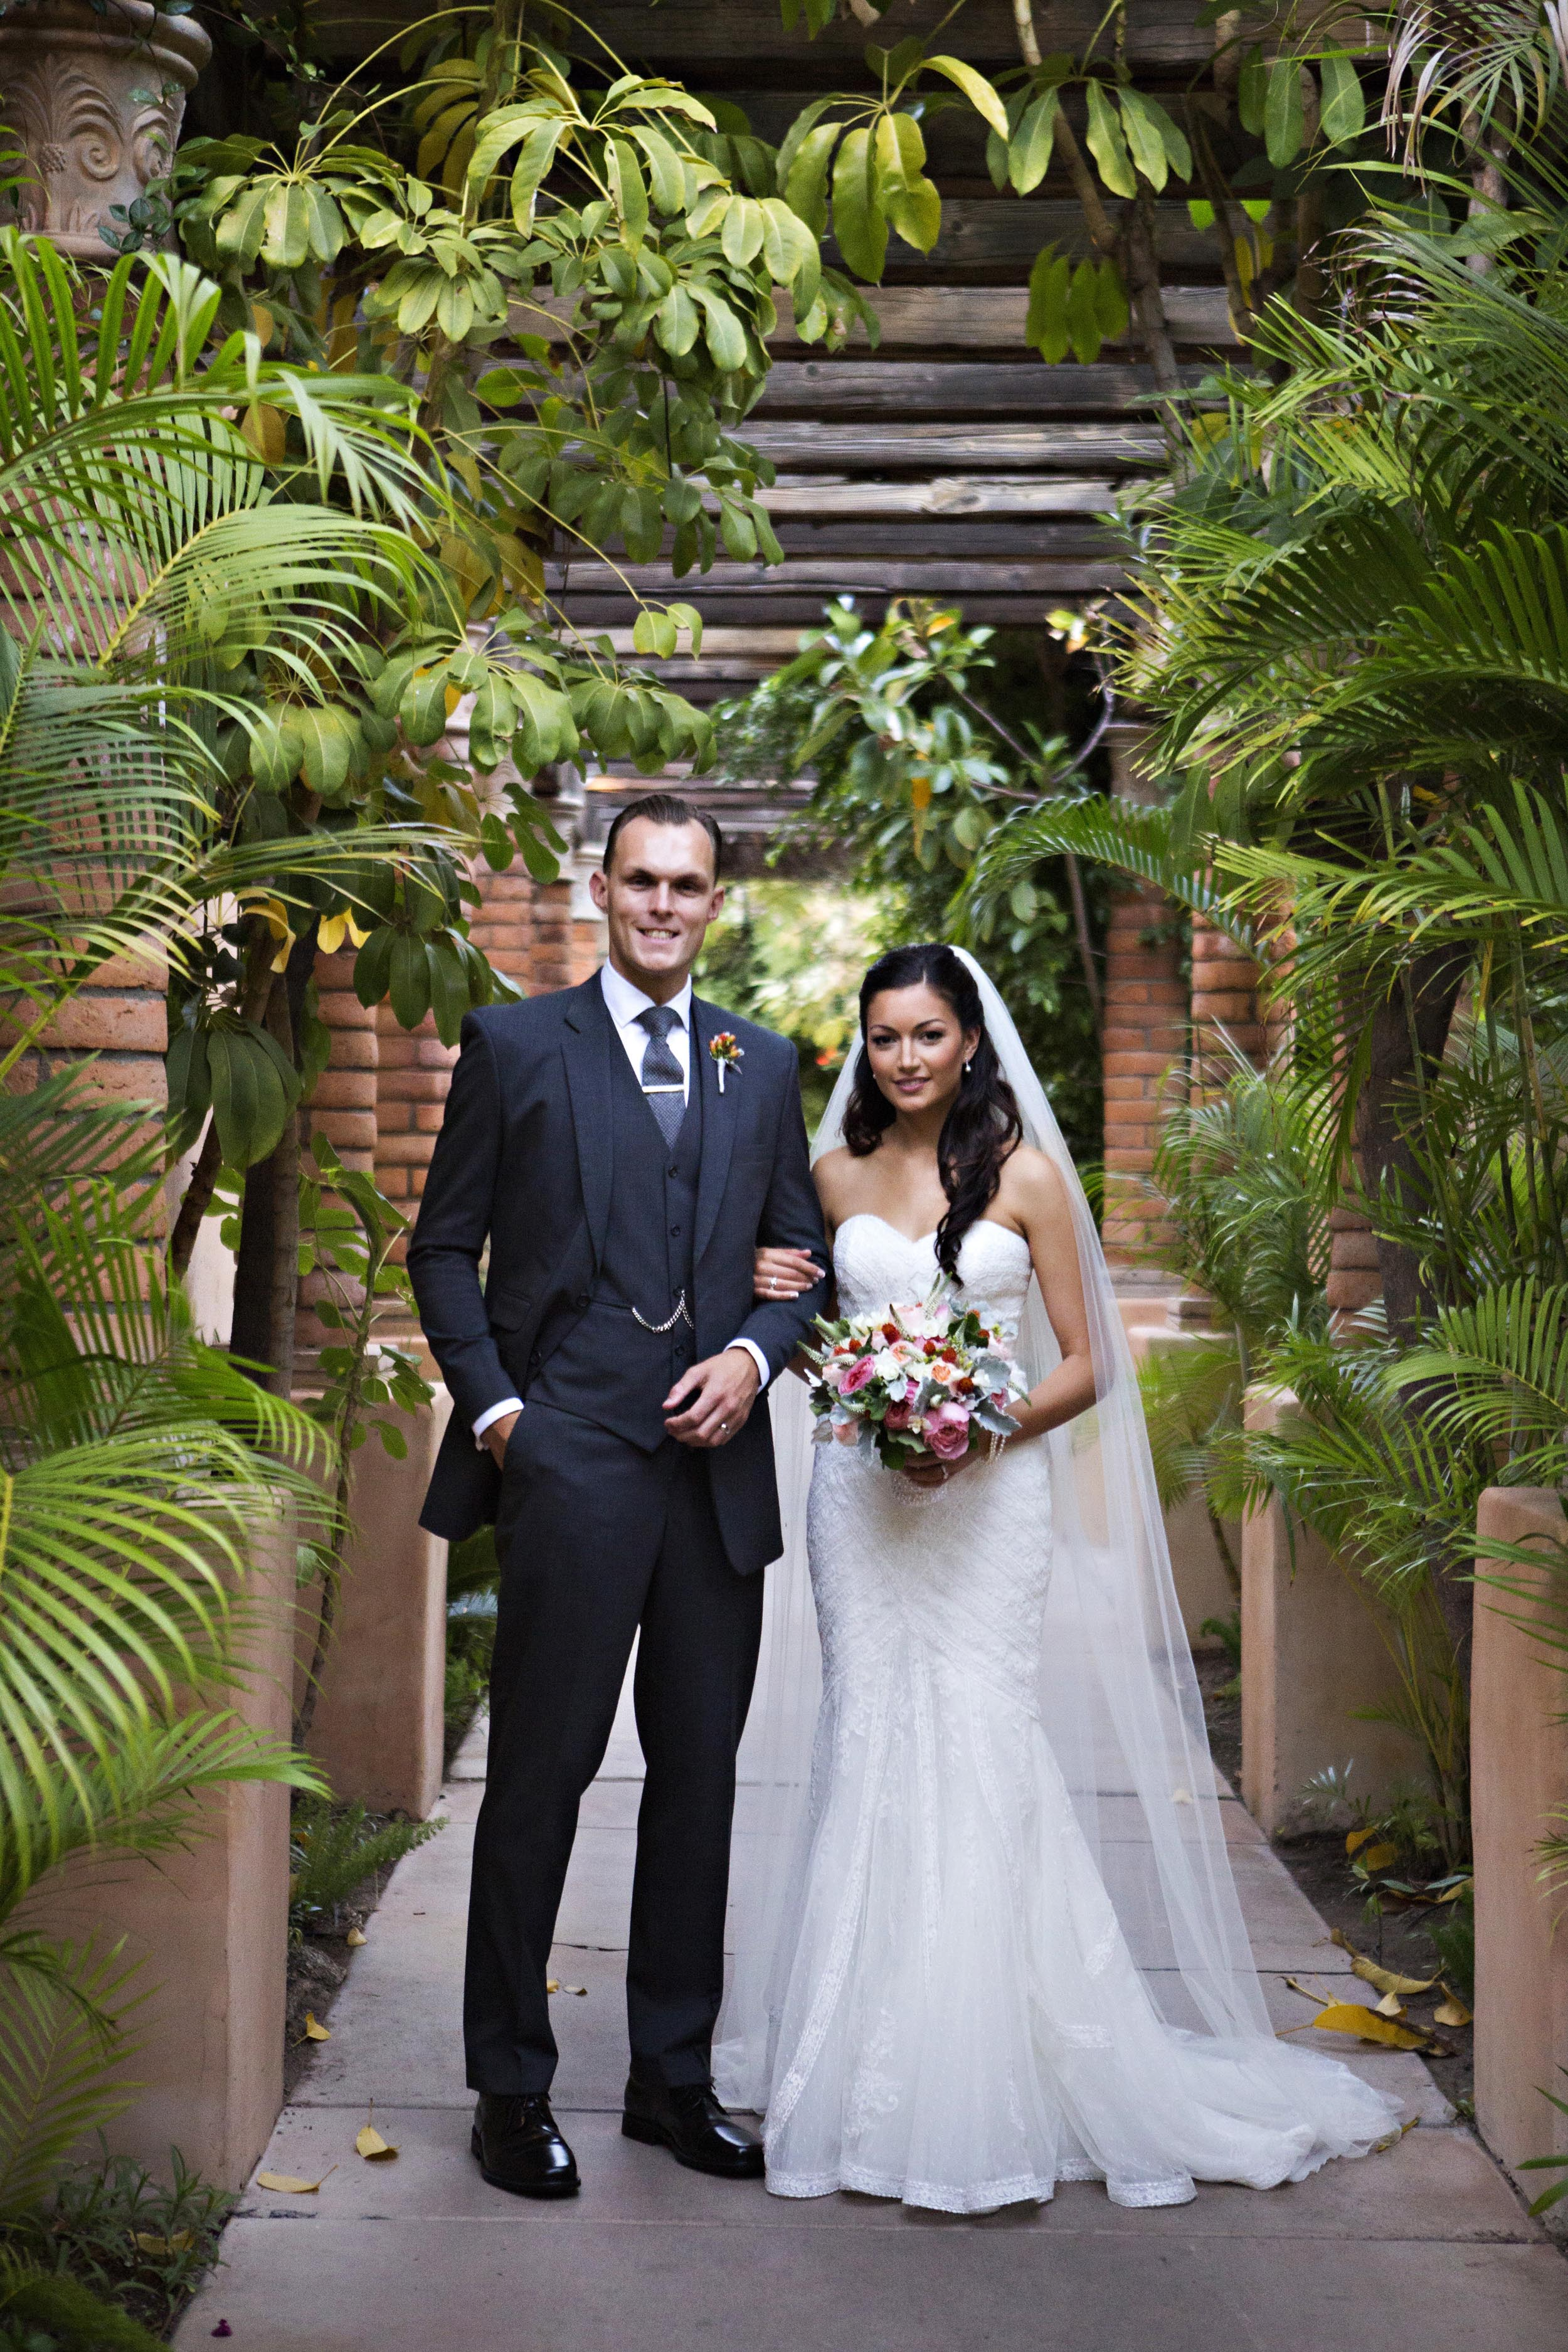 weddings-royalpalms-16.JPG